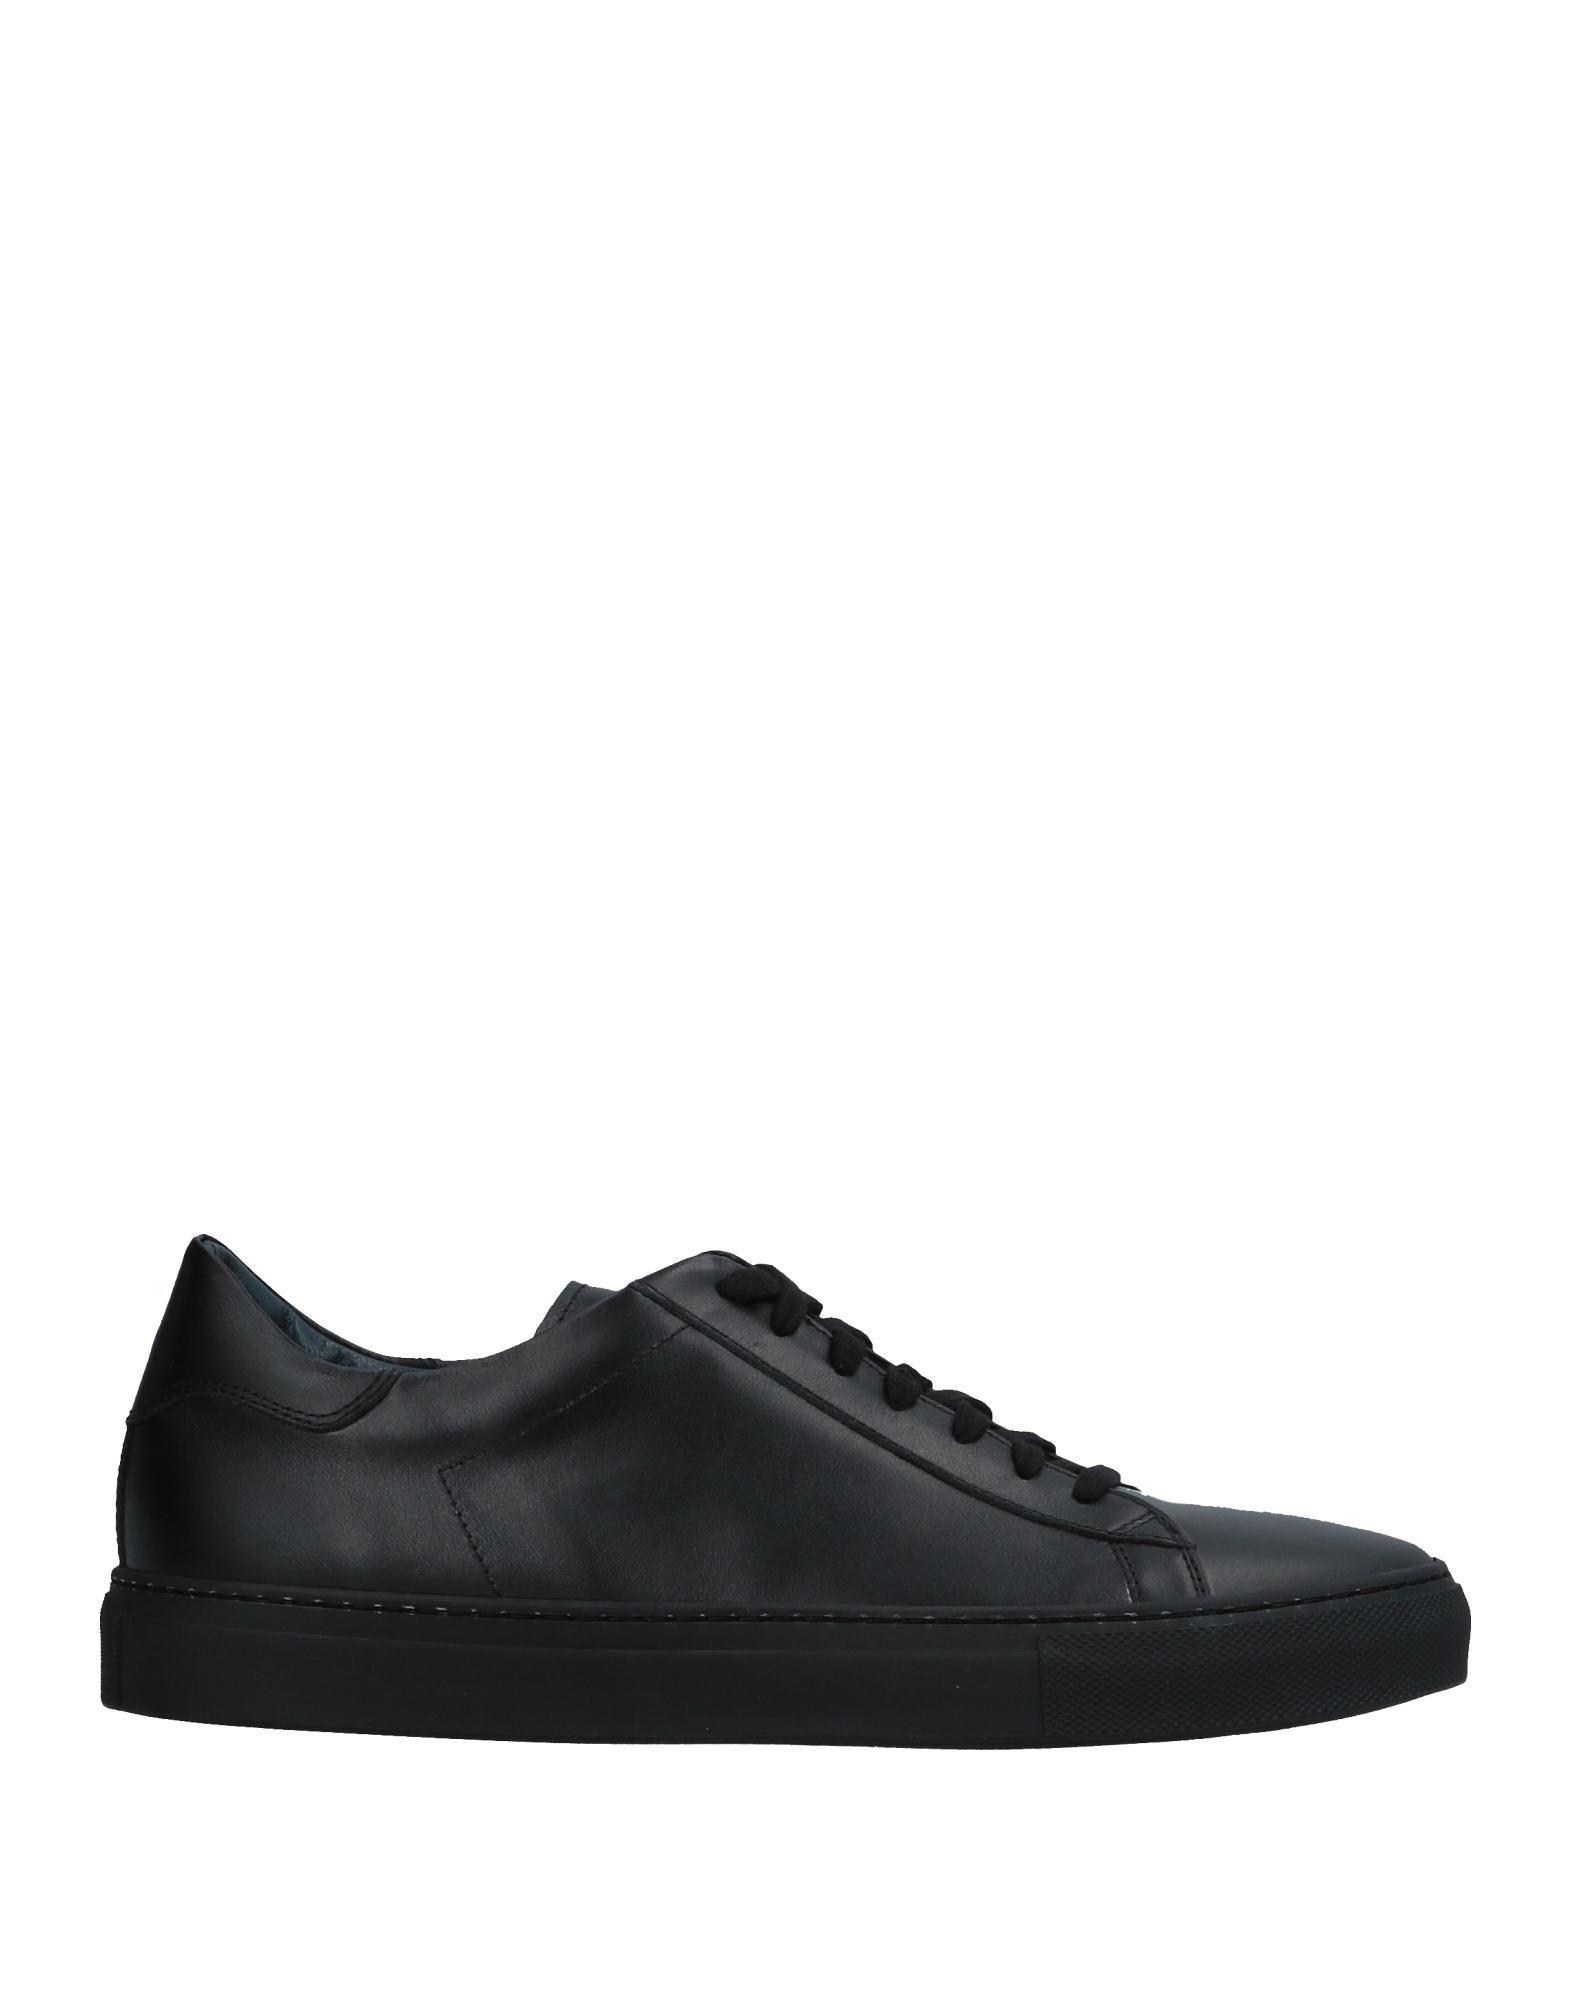 Fabiano Ricci Sneakers Herren  11508852MD Gute Qualität beliebte Schuhe